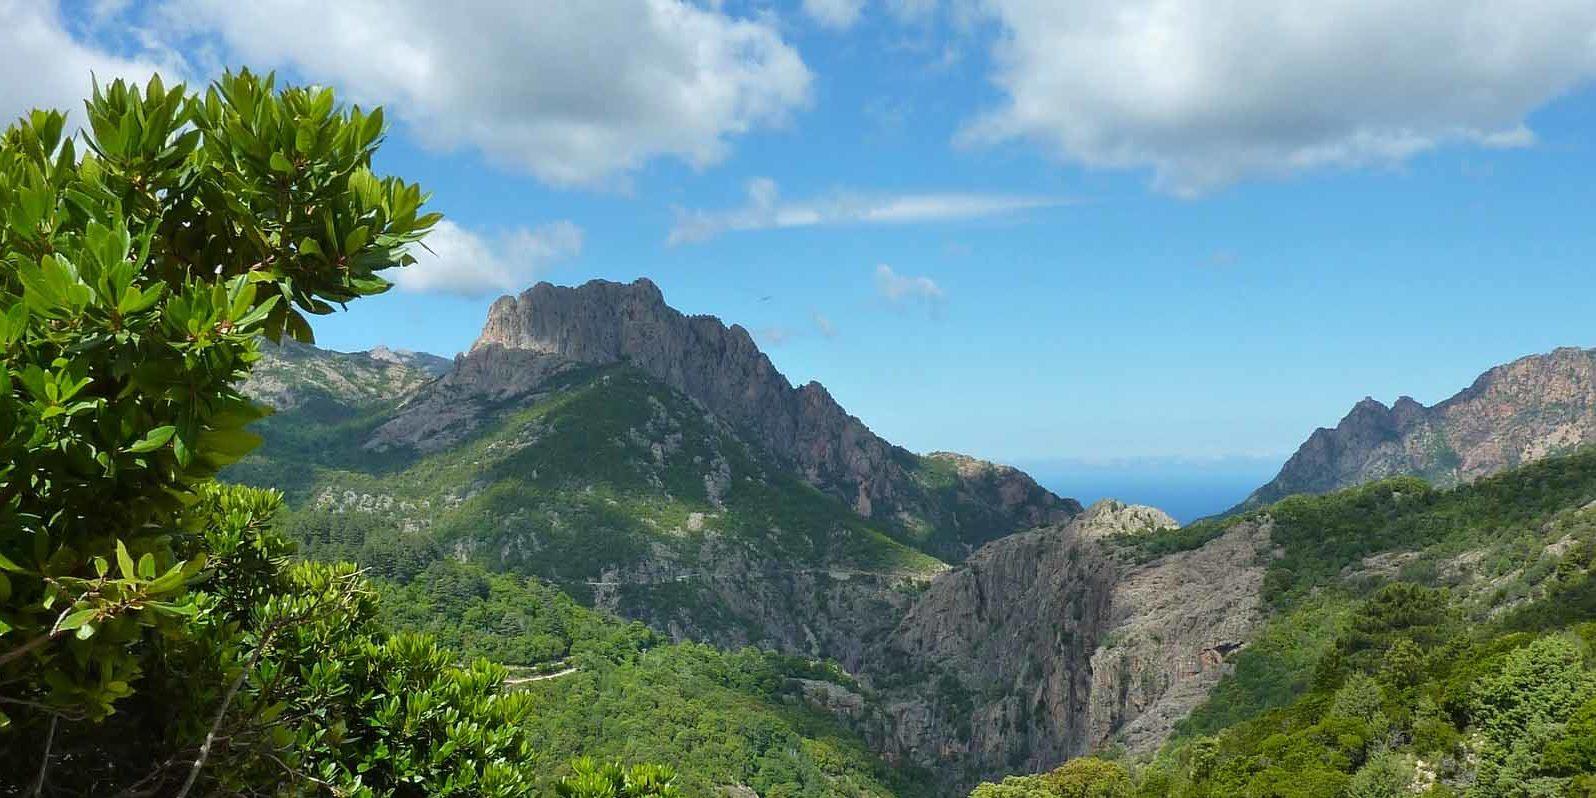 Bavella Massief Corsica Frankrijk Aiguilles de Bavella vallei bergen